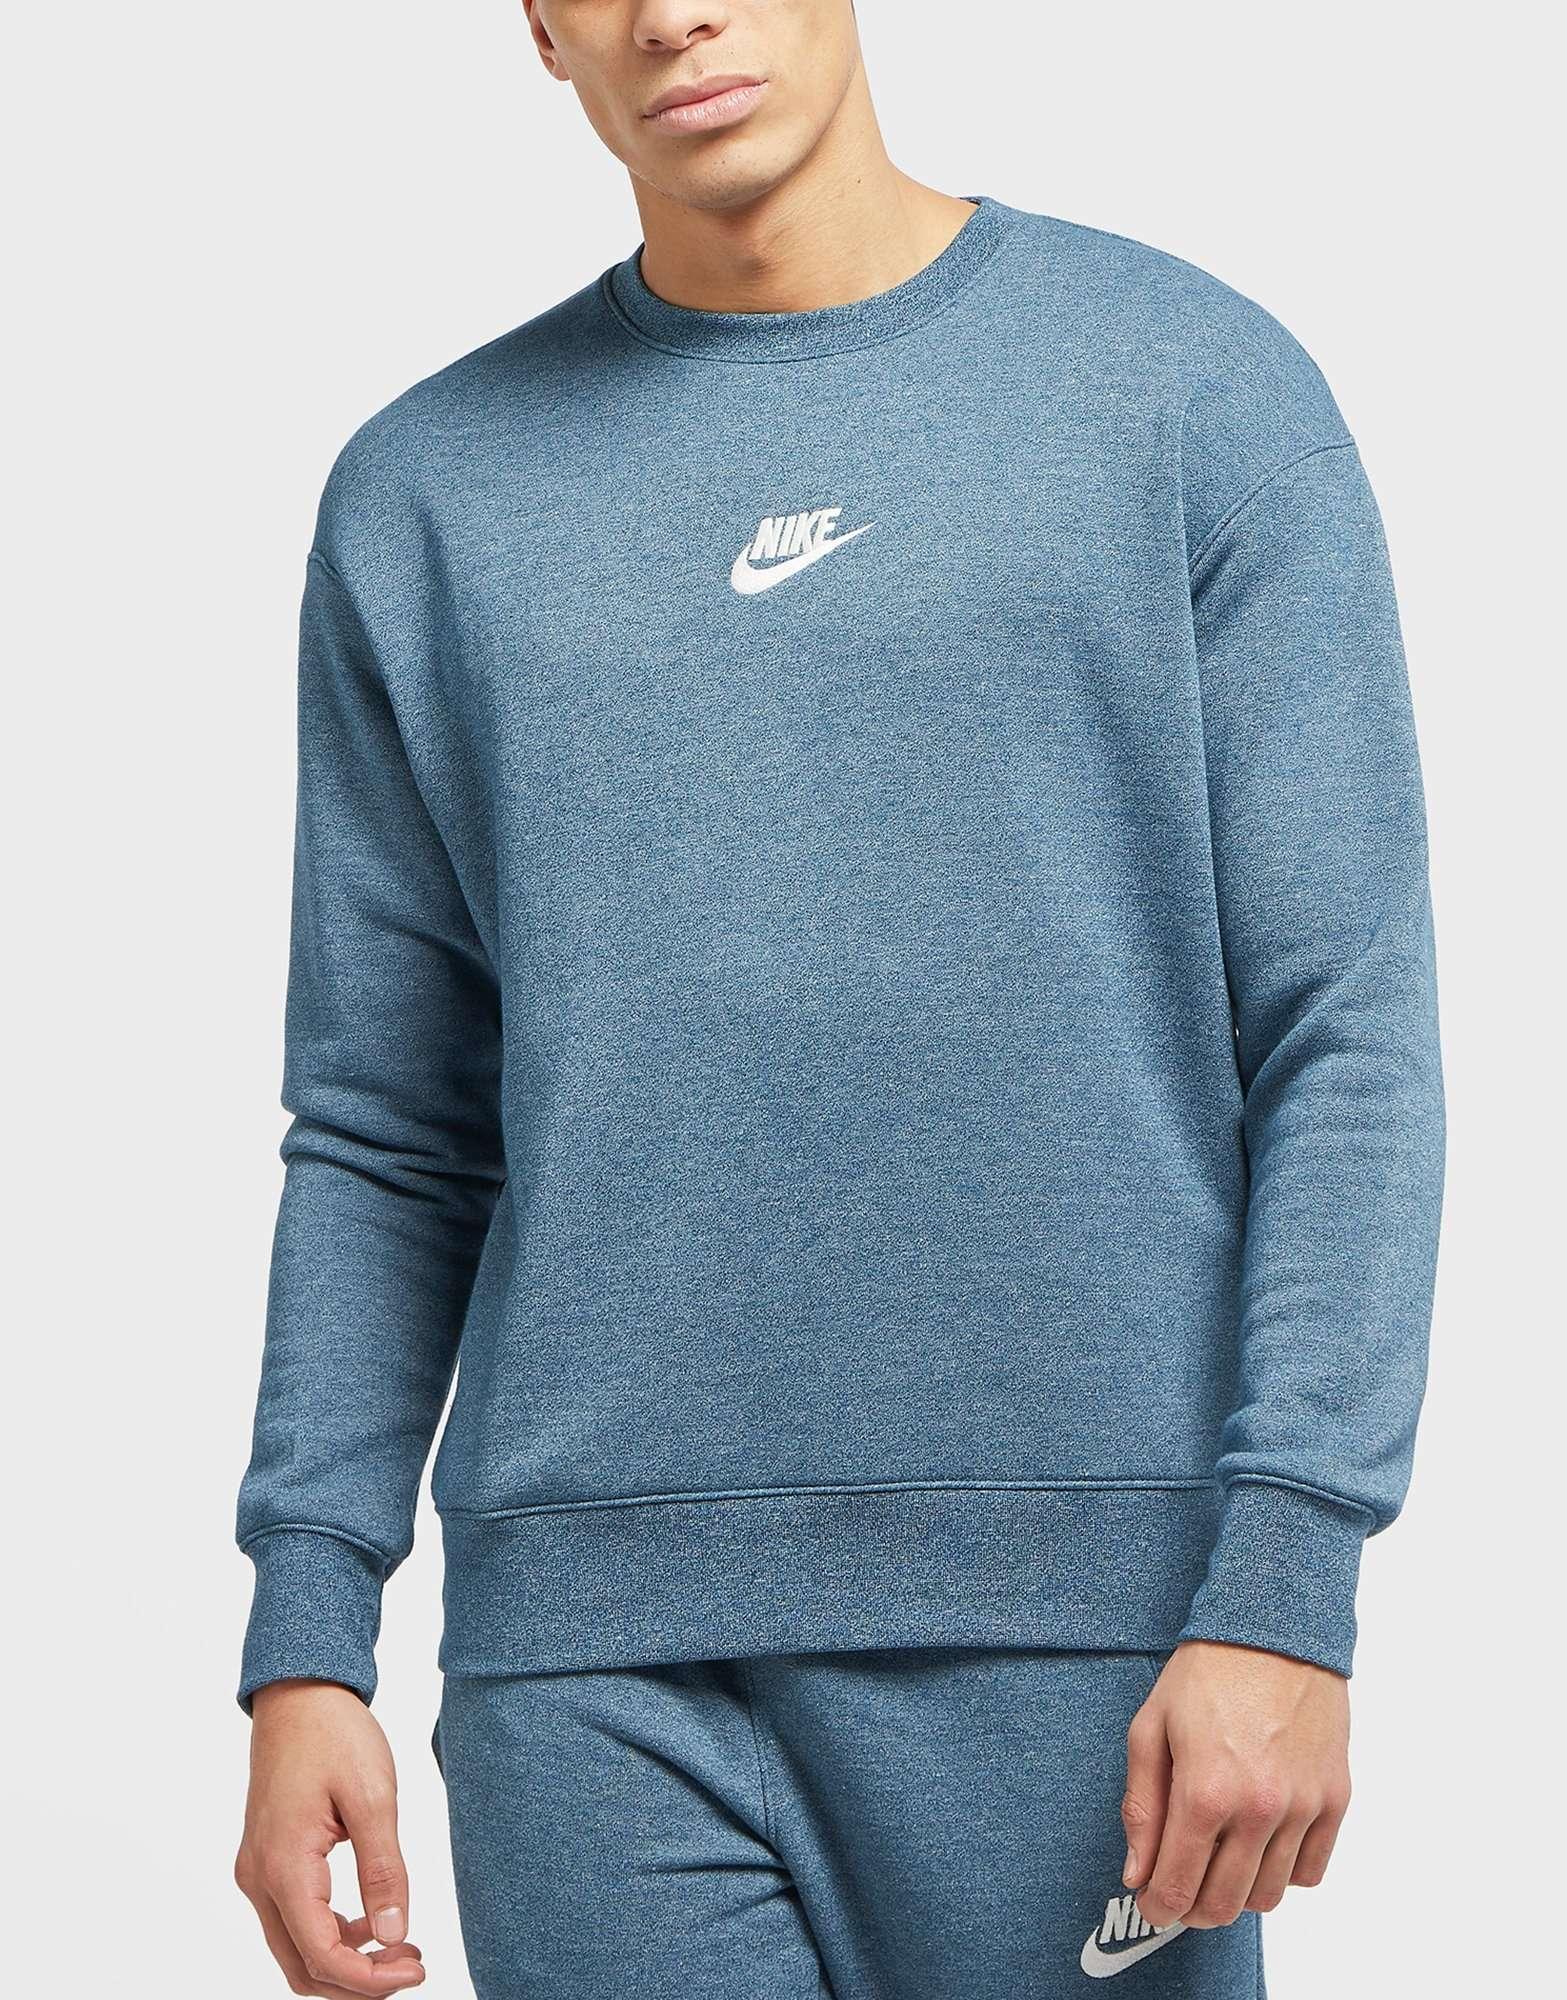 908315189ab2e1 Nike Vintage Marl Crew Neck Sweatshirt – EDGE Engineering and ...